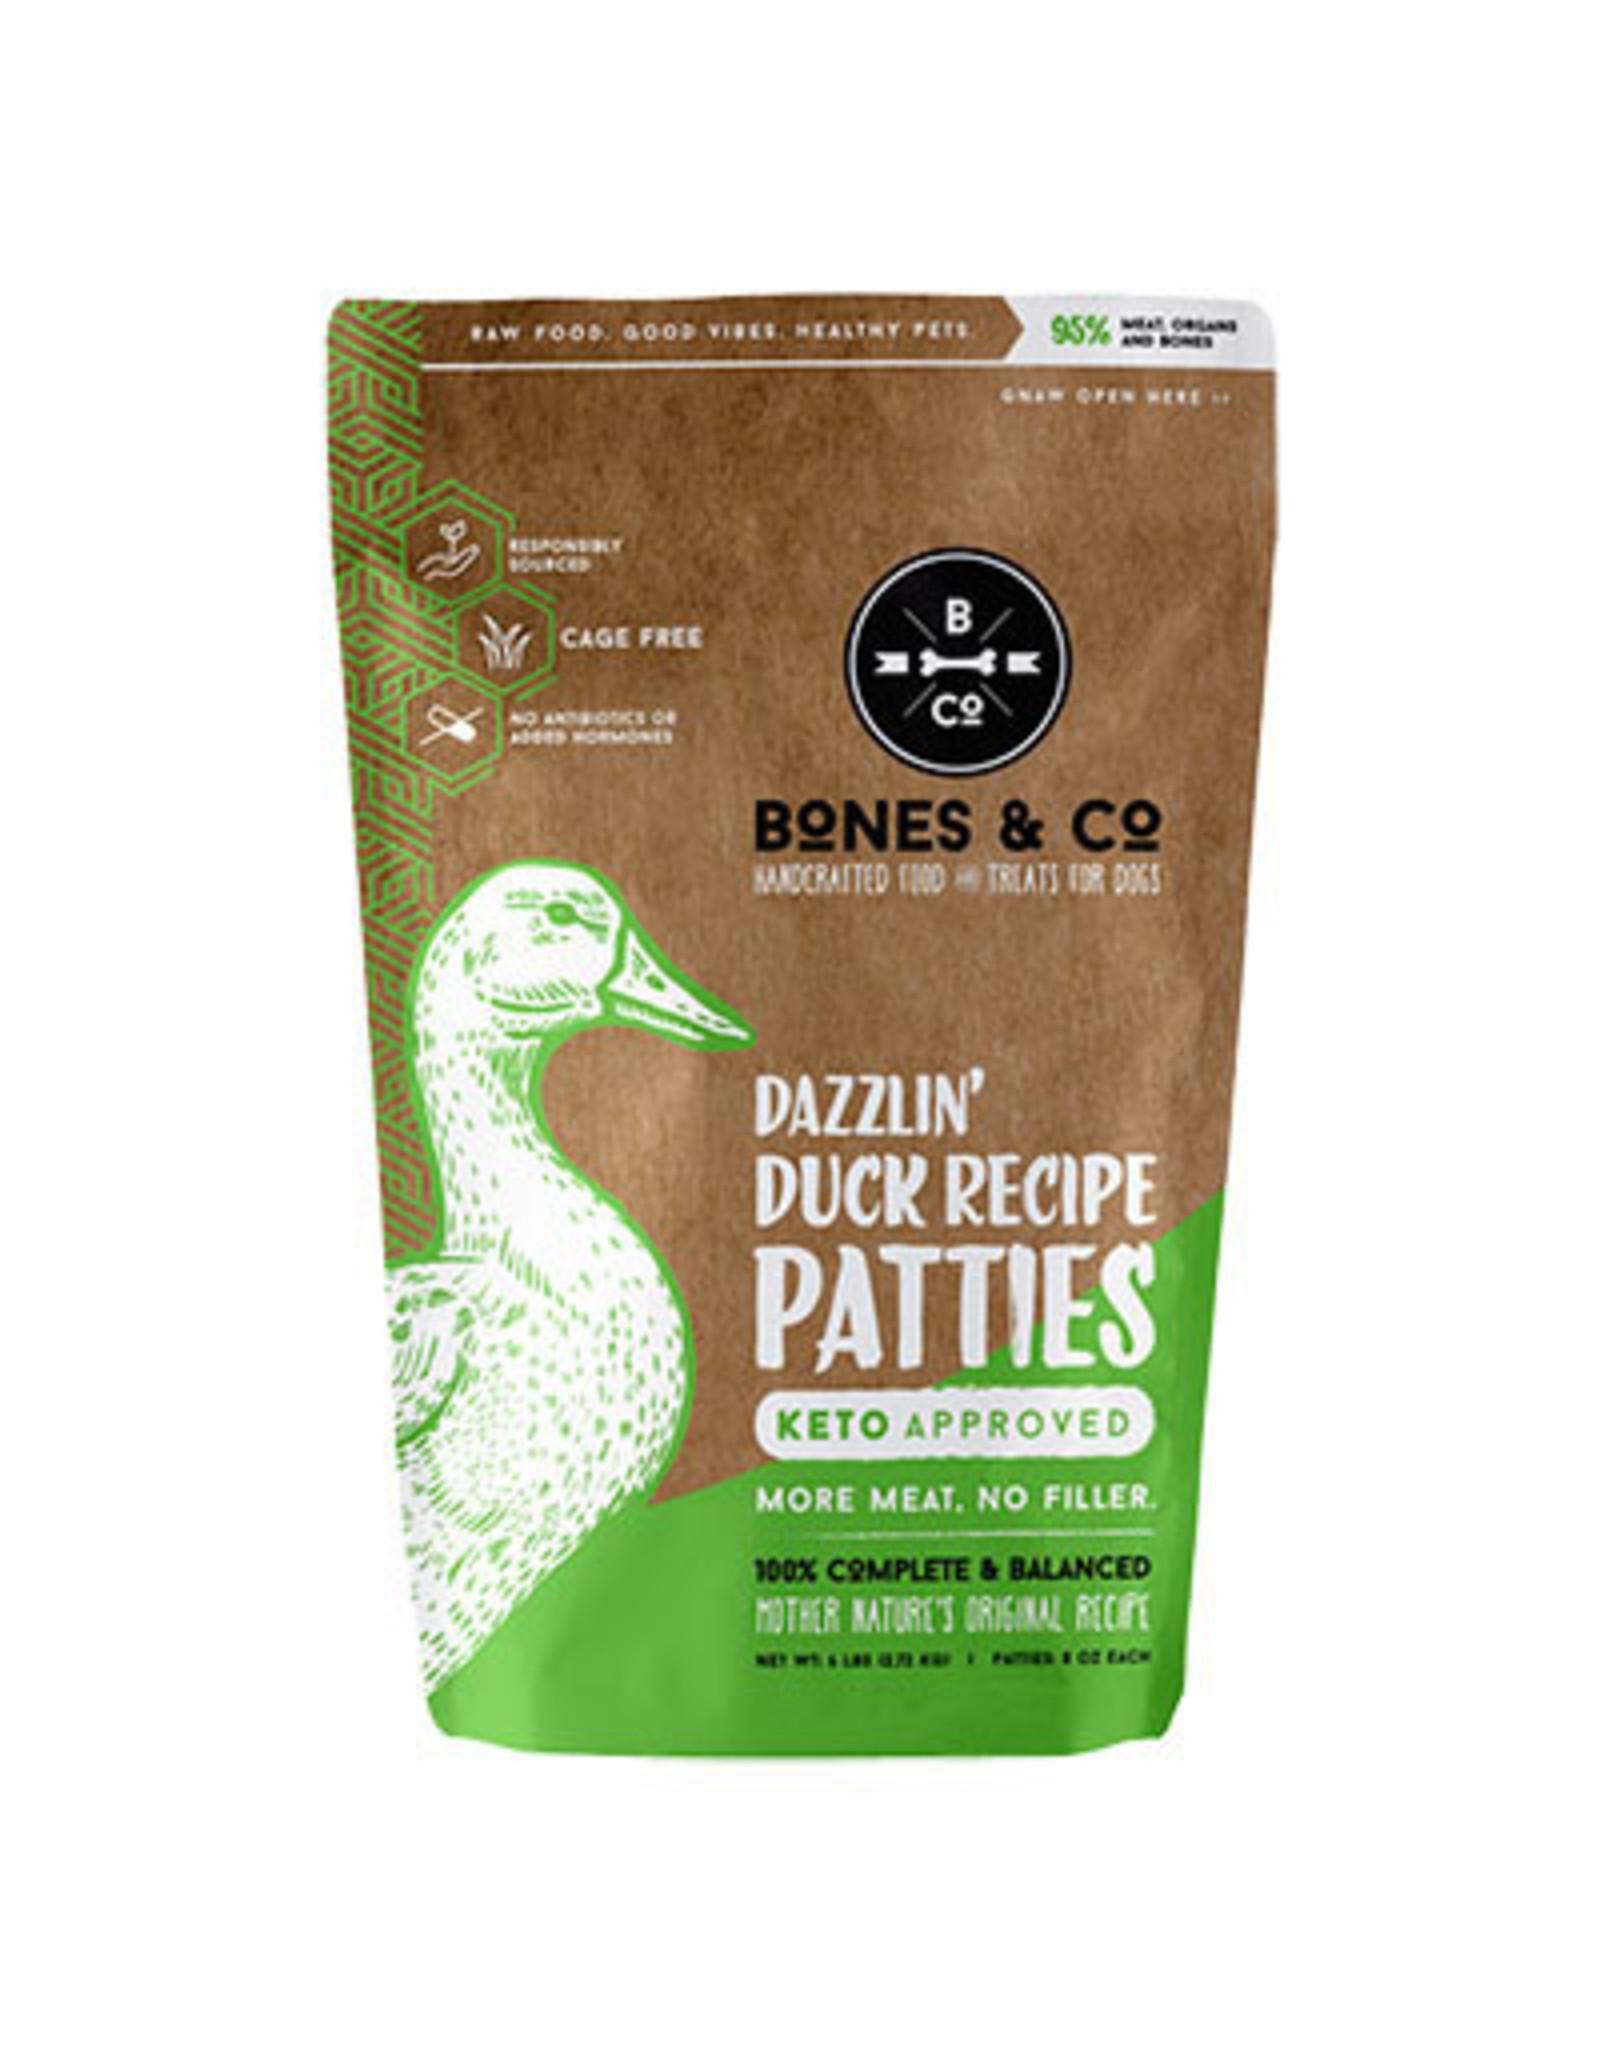 The Bones & Co. THE BONES & CO. DOG FROZEN RAW DAZZLIN' DUCK RECIPE